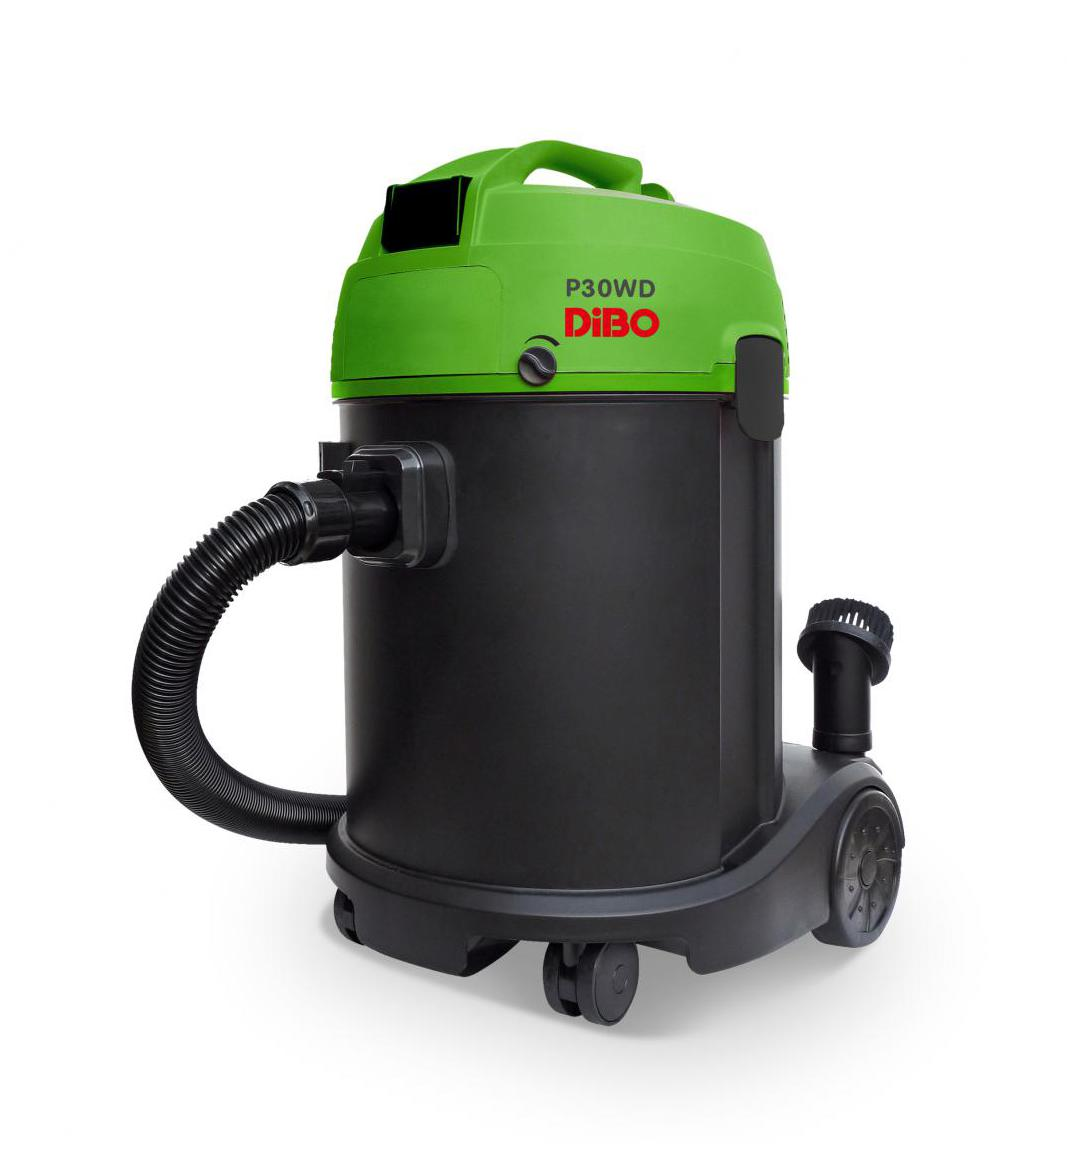 dibo-stofwaterzuiger-p30